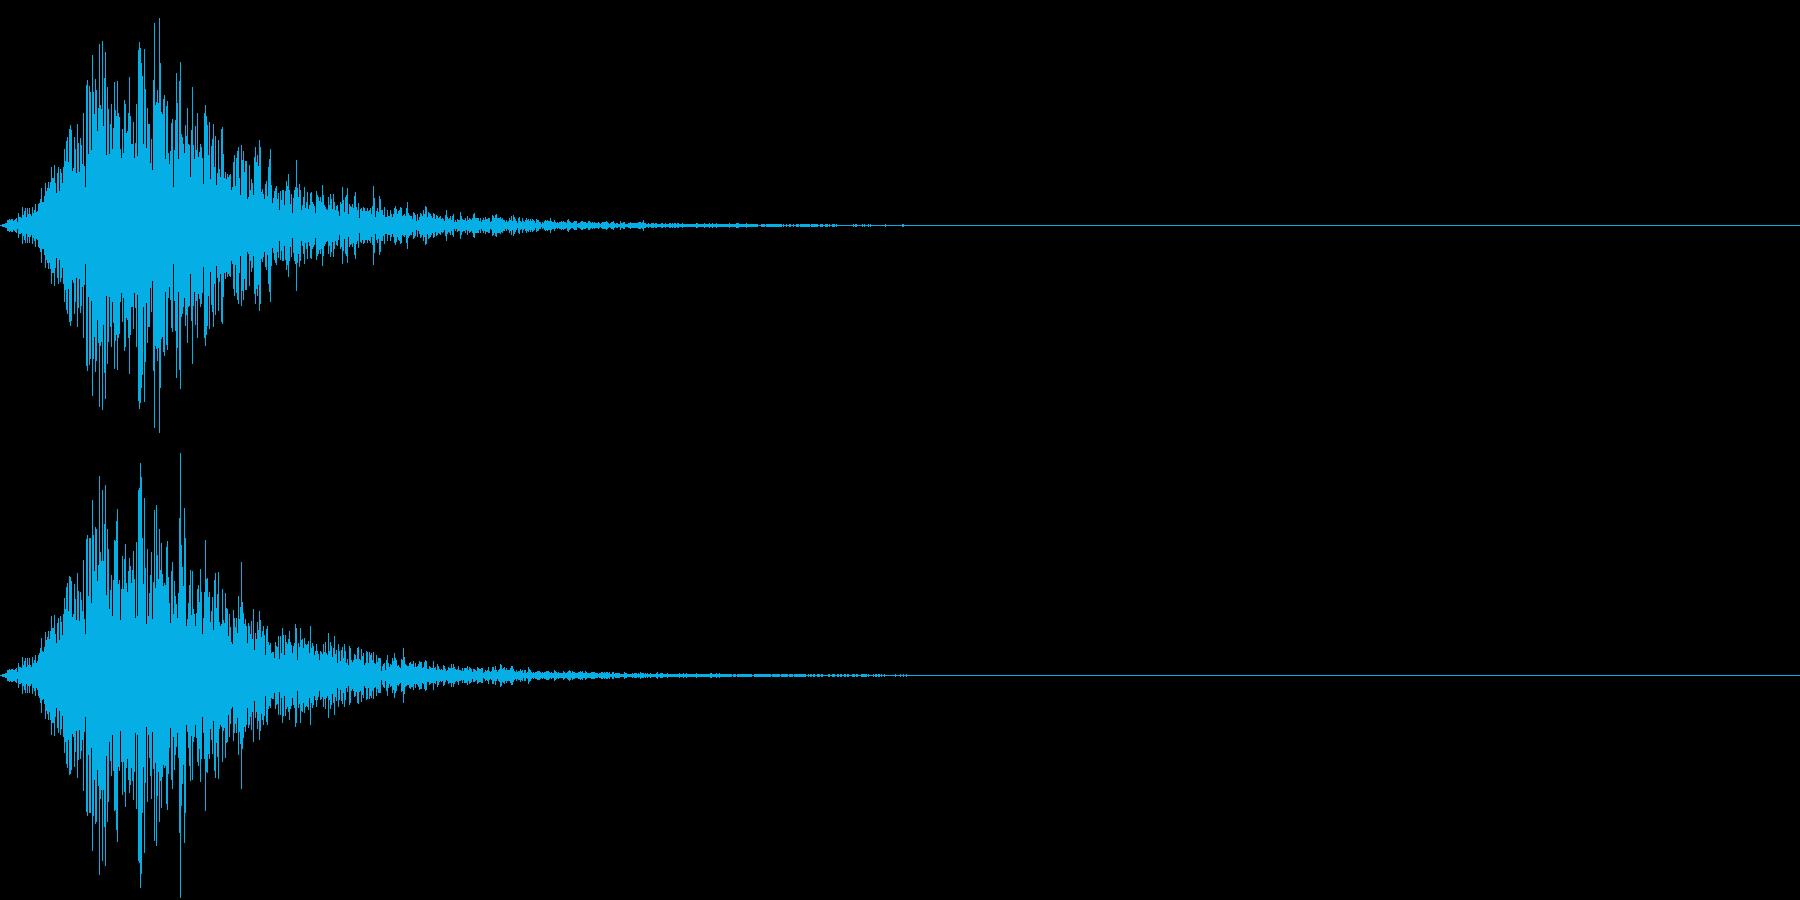 Battle 戦闘エフェクト音 8の再生済みの波形